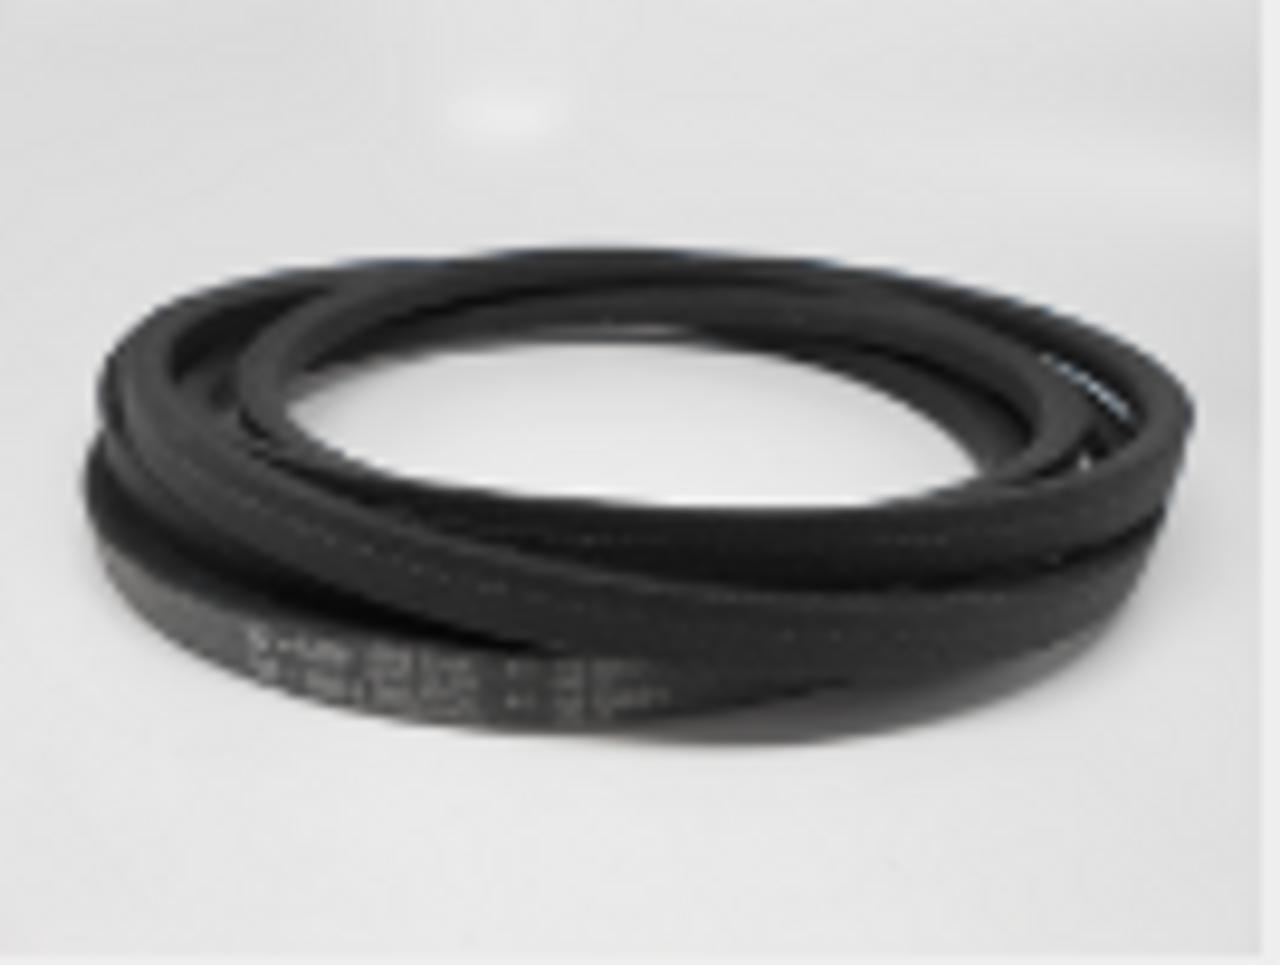 Toro Lawn Boy 92 6991 V Belt